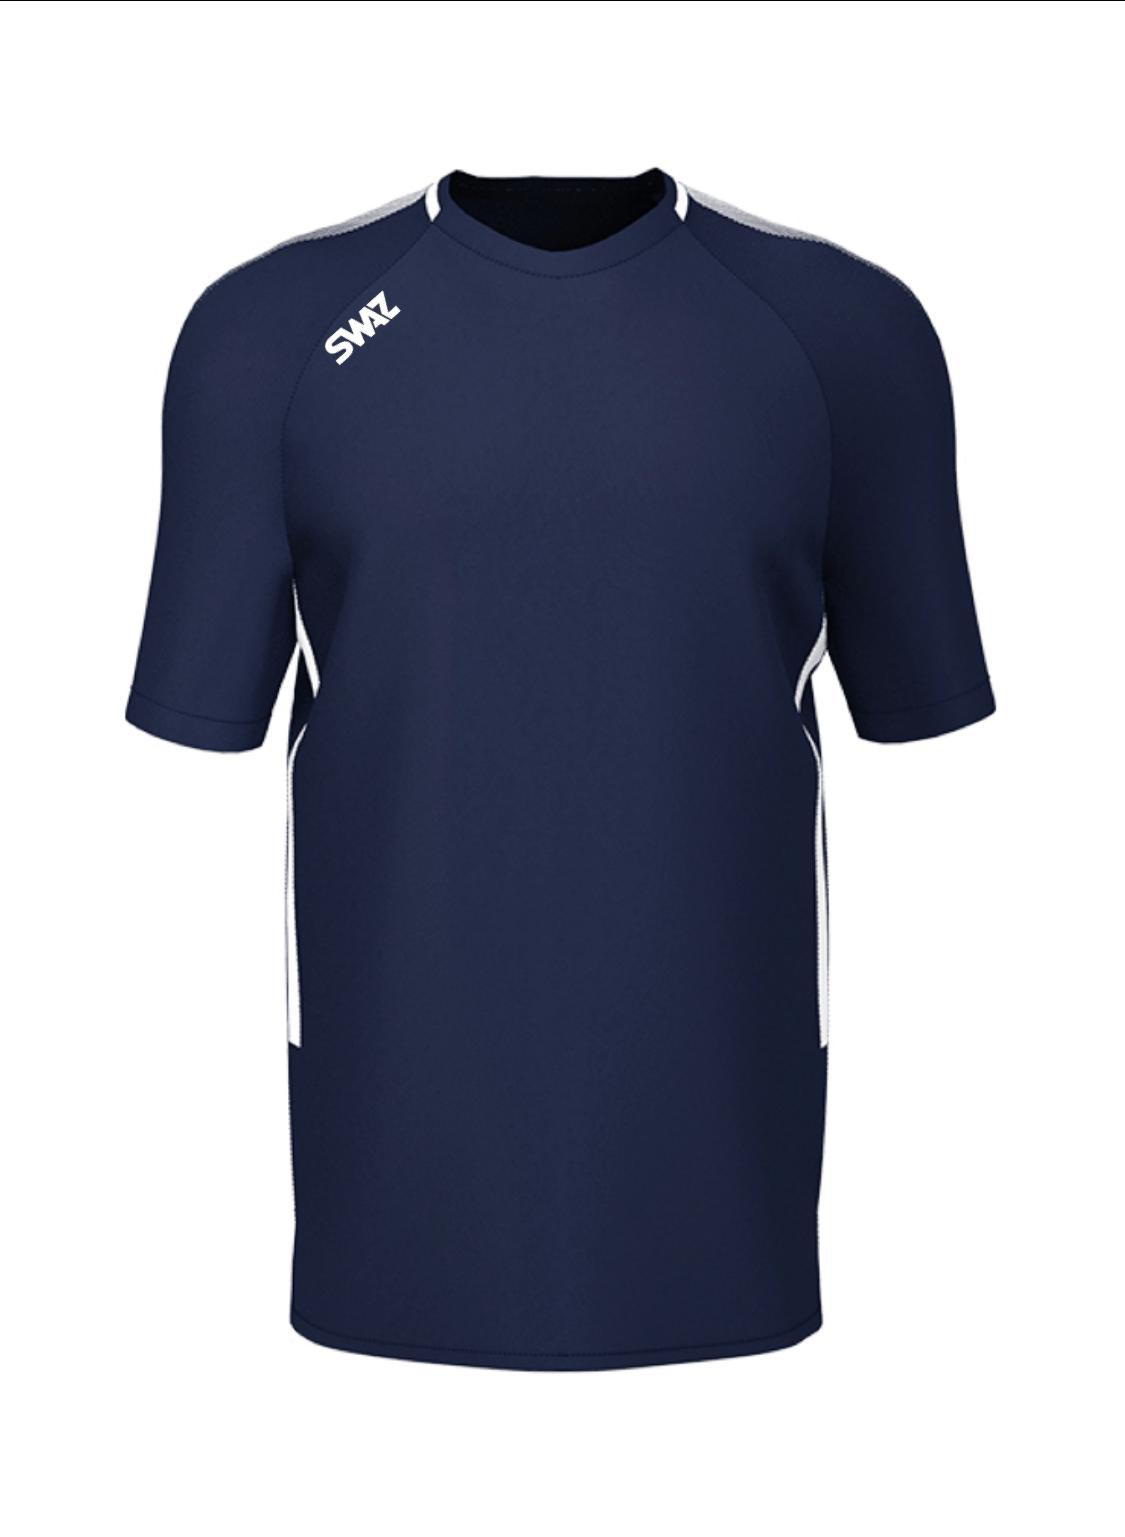 Football Training Shirt